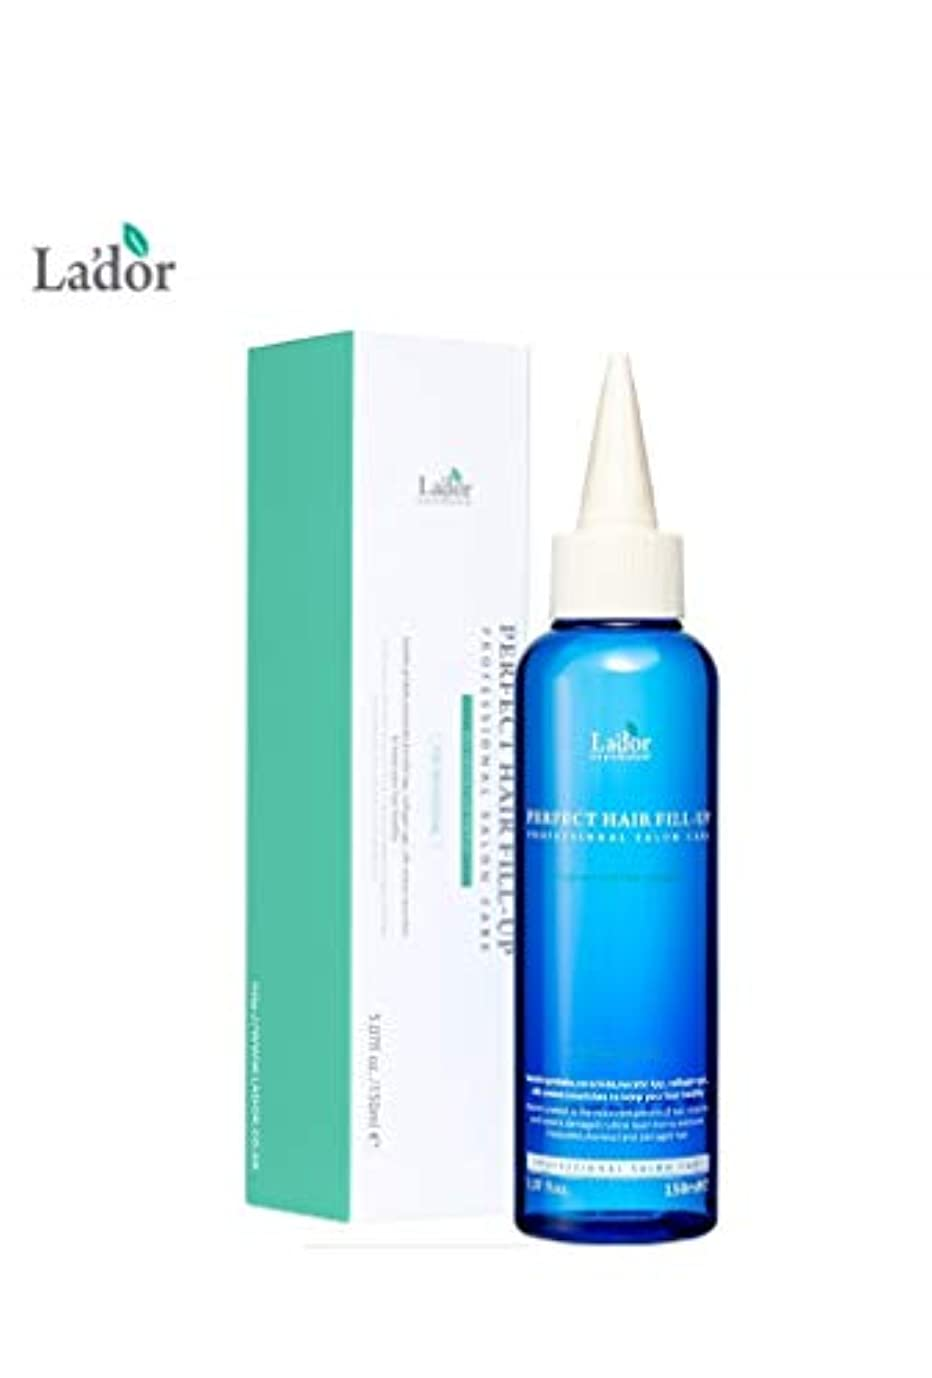 La'dor☆Perfect Hair Fill-up(Fair Ampoule)150ml アドール ヘア フィルアップ ヘアアンプル150ml [並行輸入品]